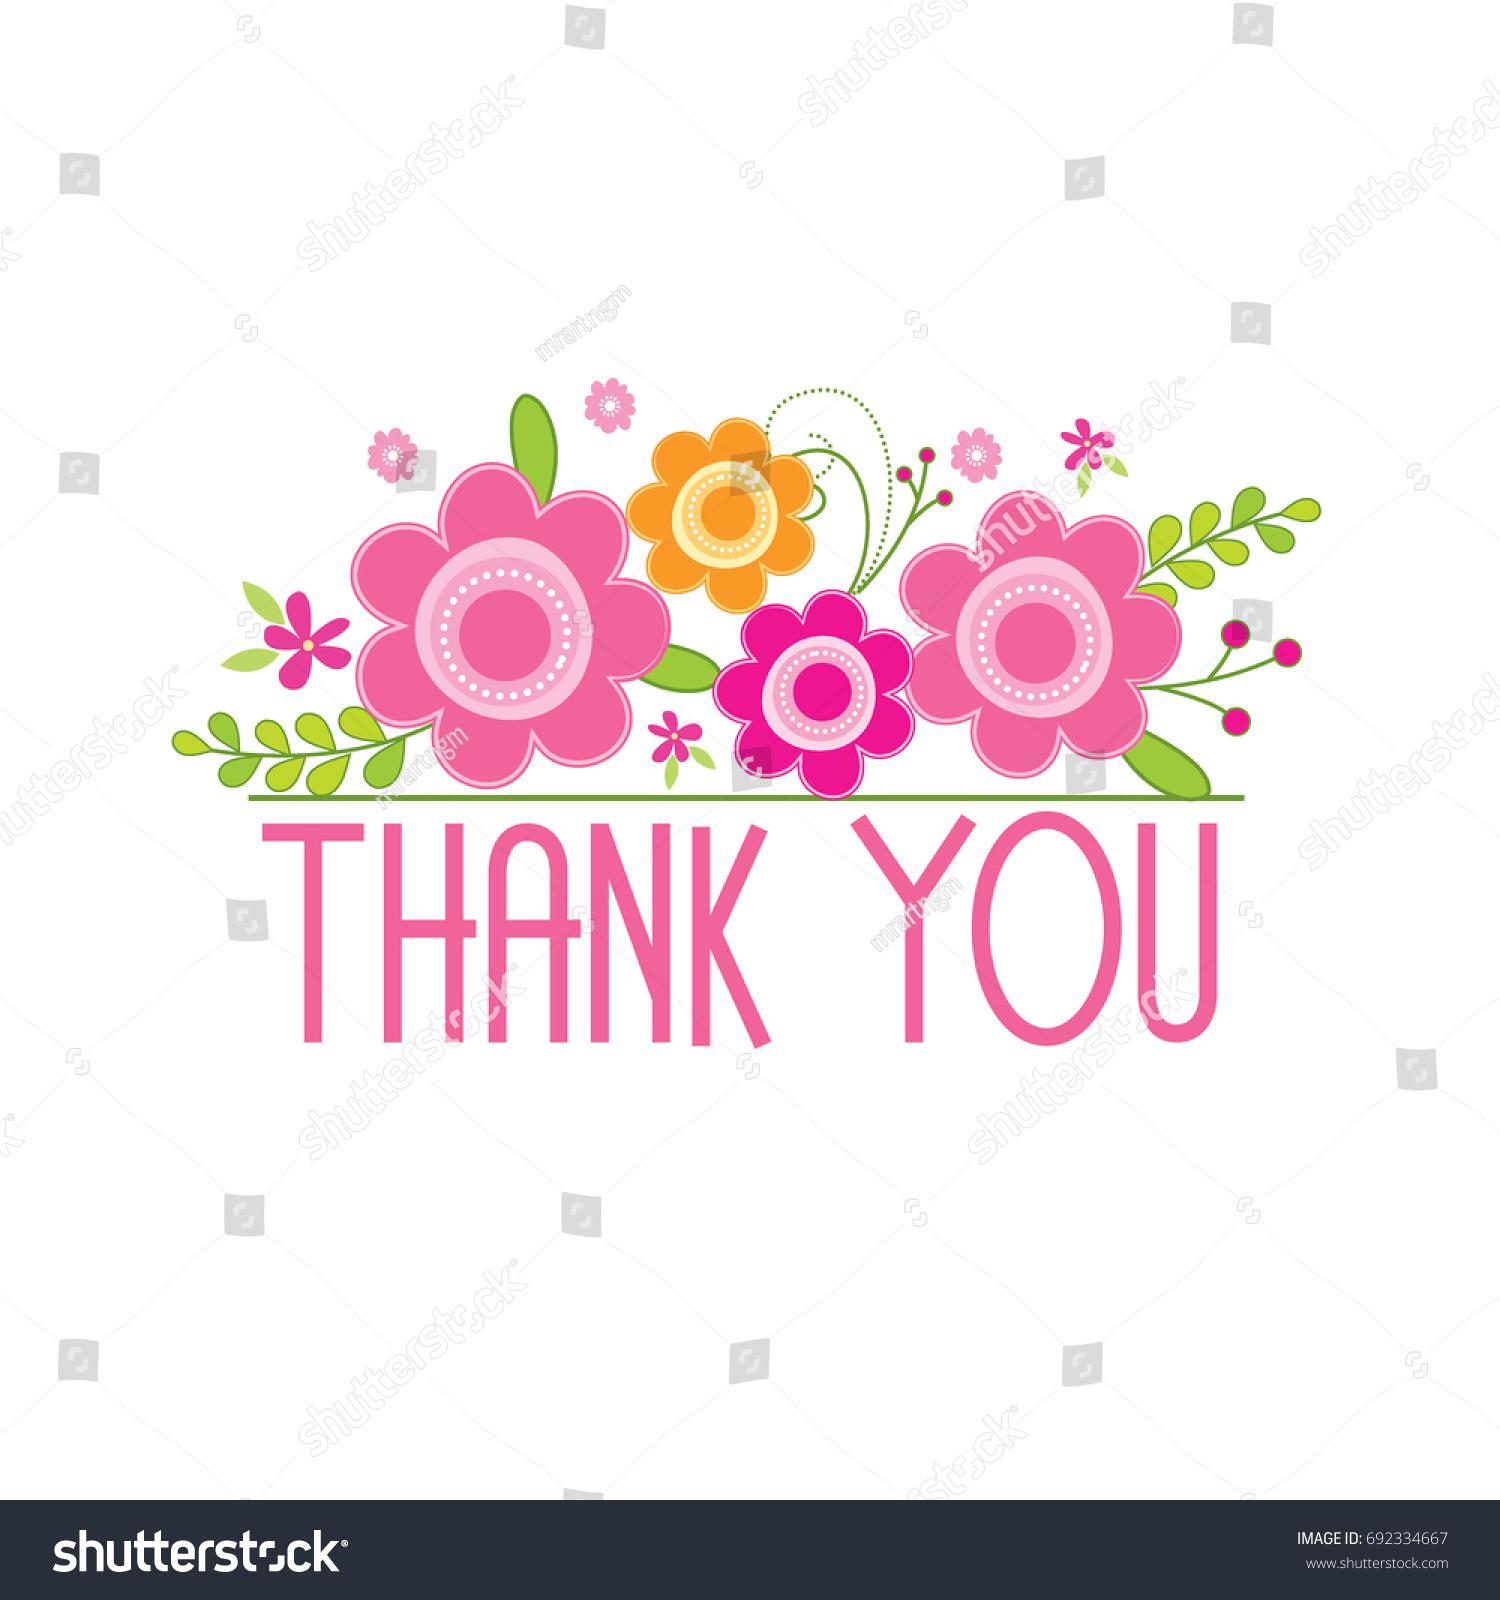 Thank you card beautiful flower design stock vector royalty free thank you card with beautiful flower design izmirmasajfo